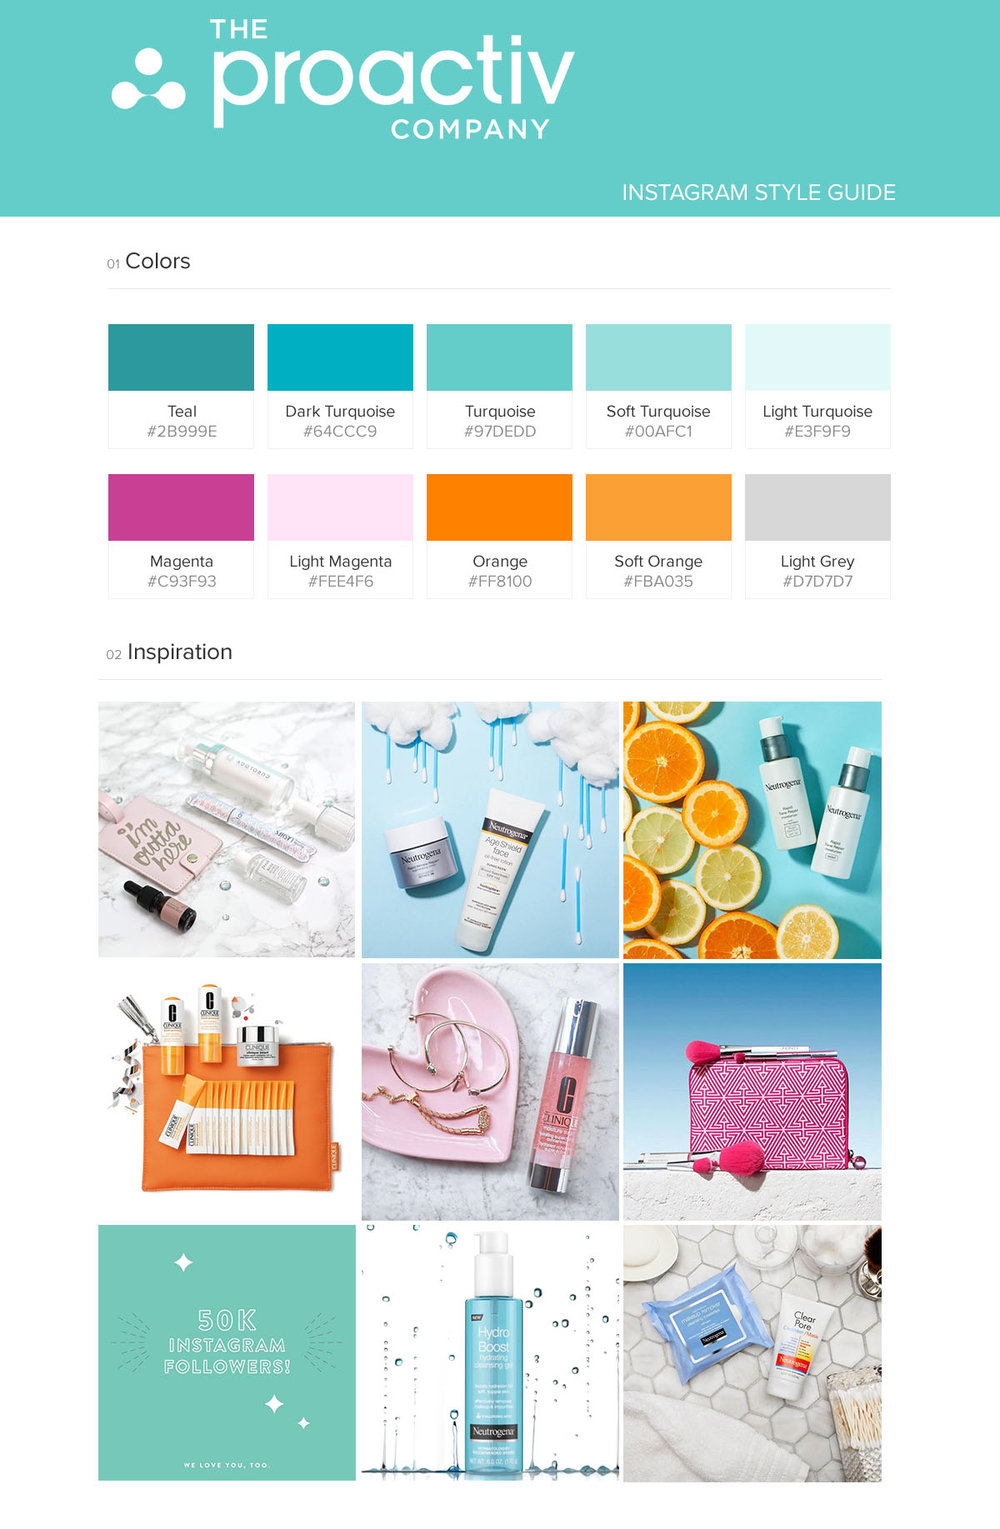 IG Style Guide 1.jpg